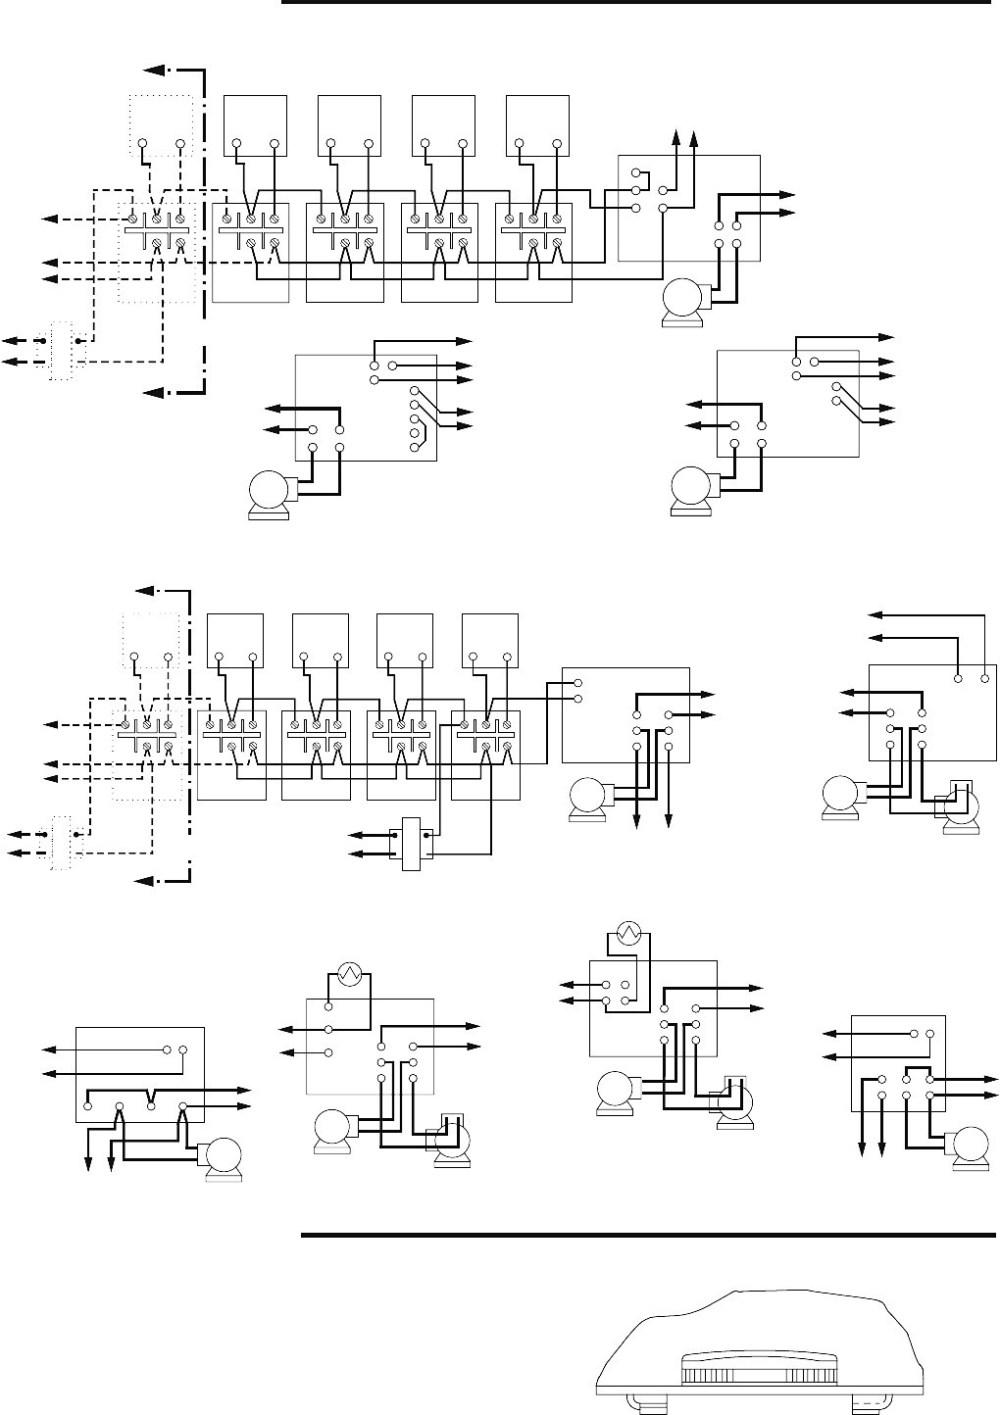 medium resolution of white rodgers aquastat wiring diagram wiring diagrams rh 48 shareplm de white rodgers 1361 zone valve wiring diagrams white rodgers zone valve diagram